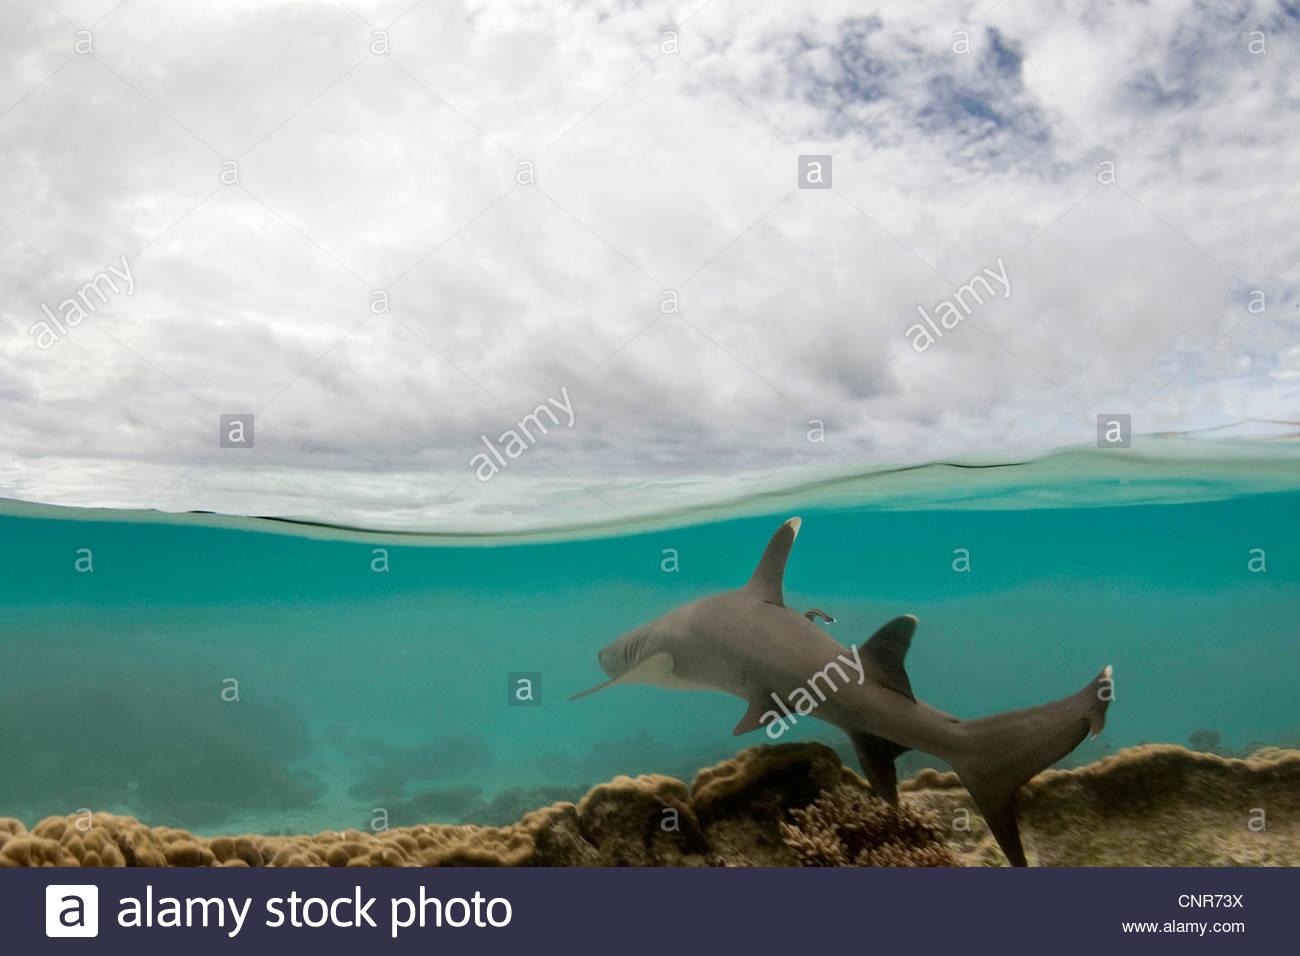 blunthead shark, whitetip reef shark (Triaenodon obesus), split level image of an white tipped reef shark swimming - Stock Image